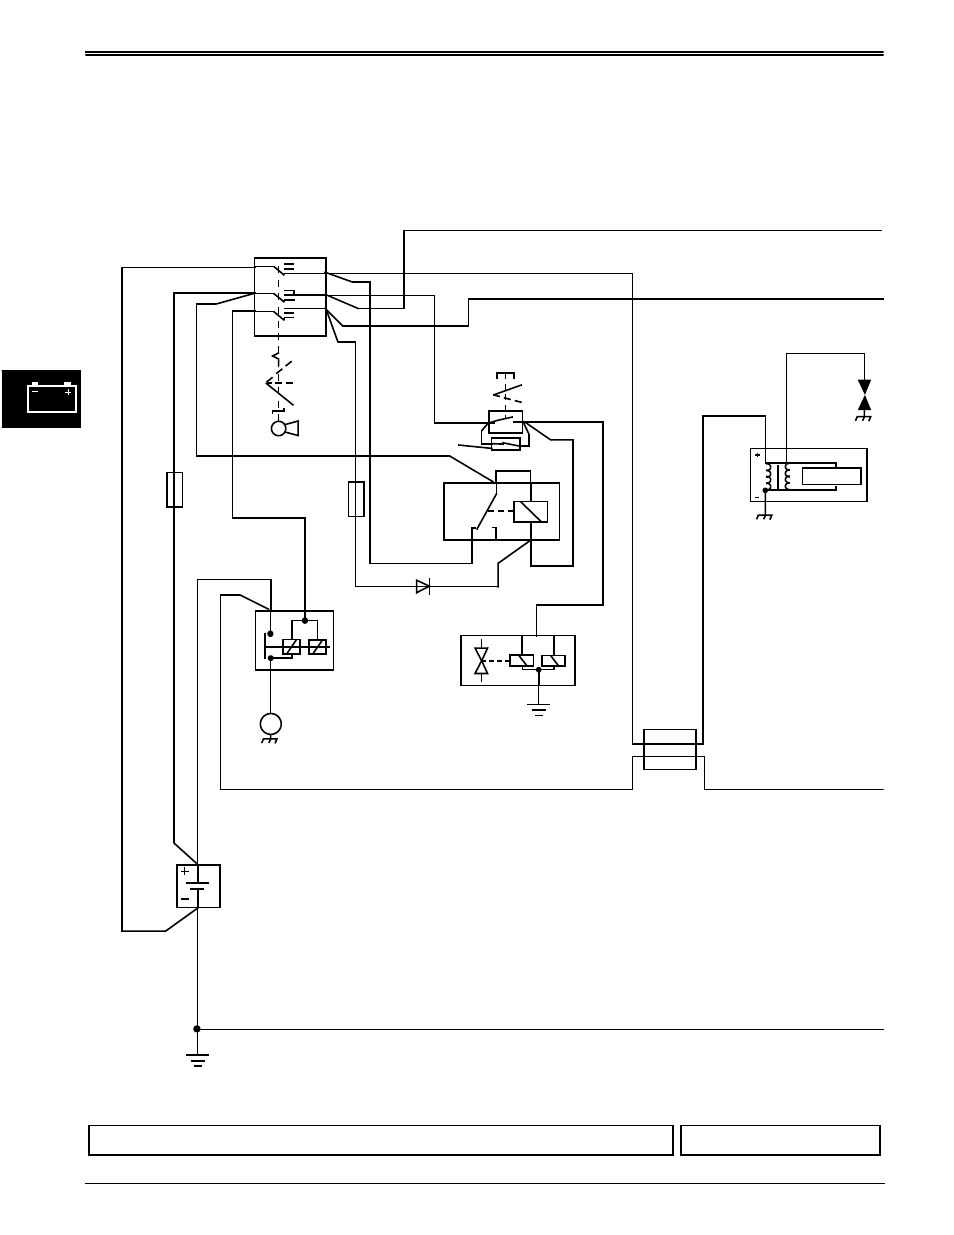 110 John Deere Wiring Diagram Wiring Schematics John Deere Stx38 User Manual Page